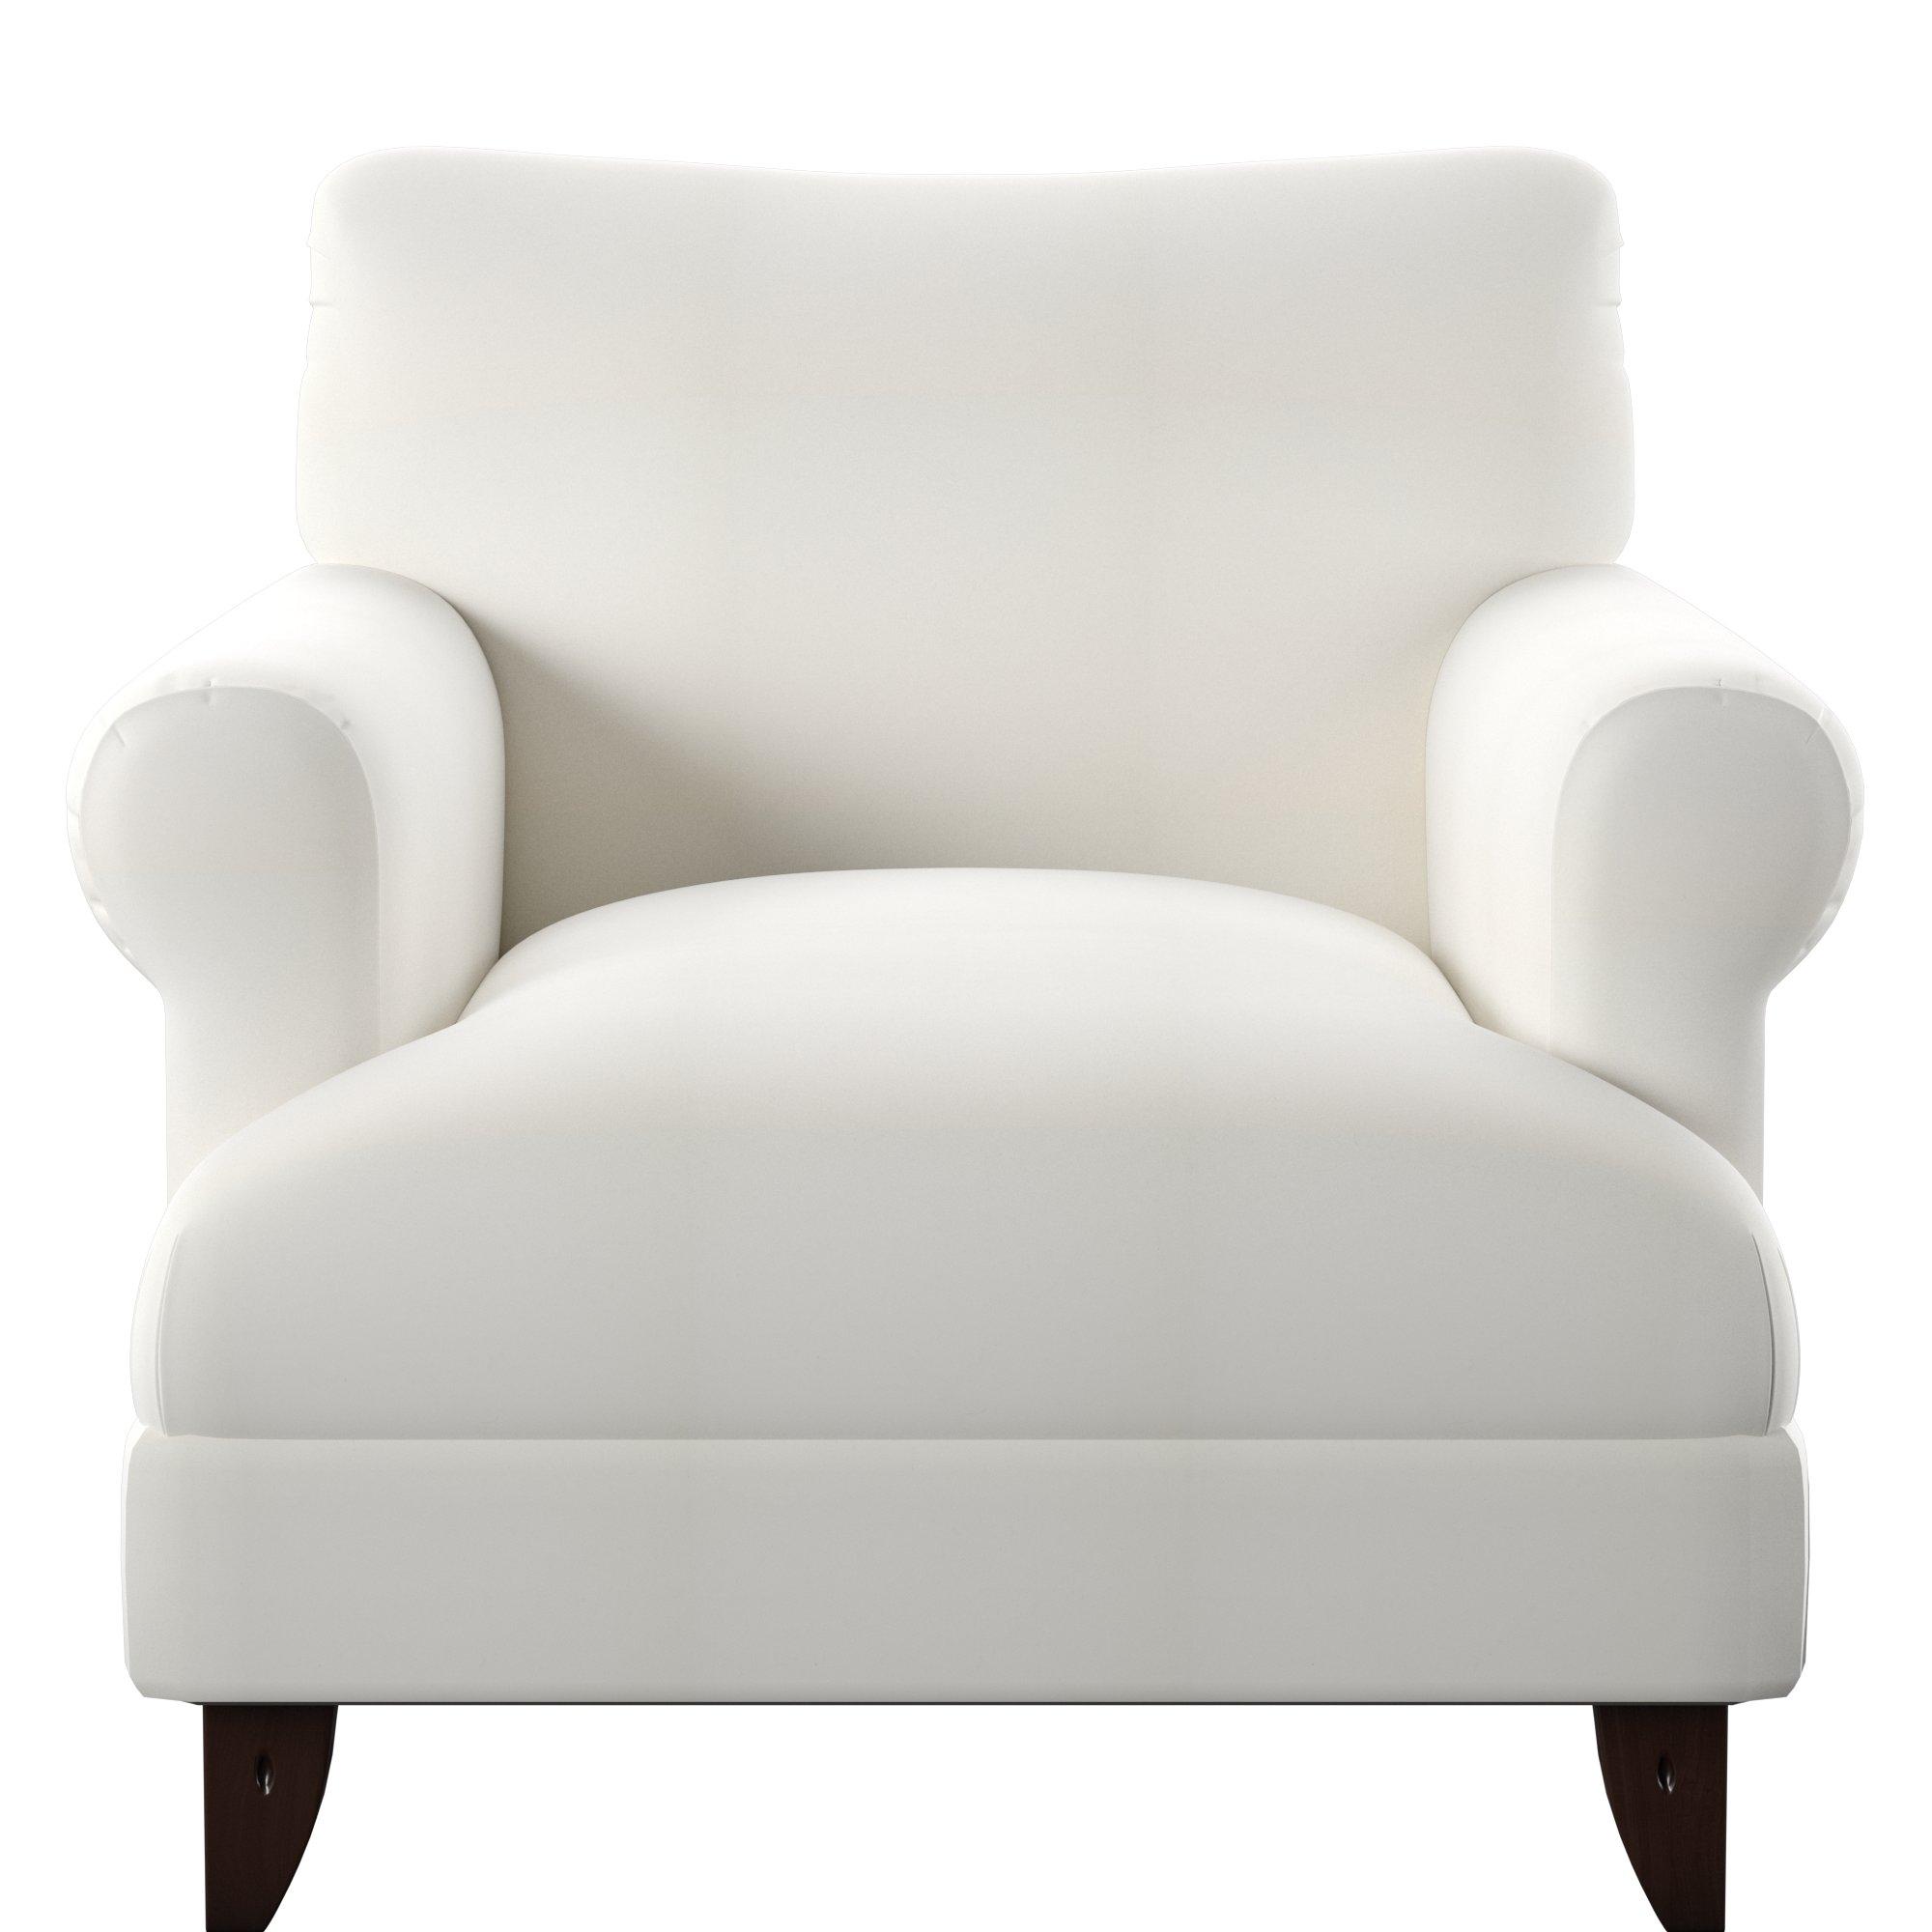 Wayfair Custom Upholstery™ Allie Armchair & Reviews | Wayfair With Allie Dark Grey Sofa Chairs (Image 25 of 25)